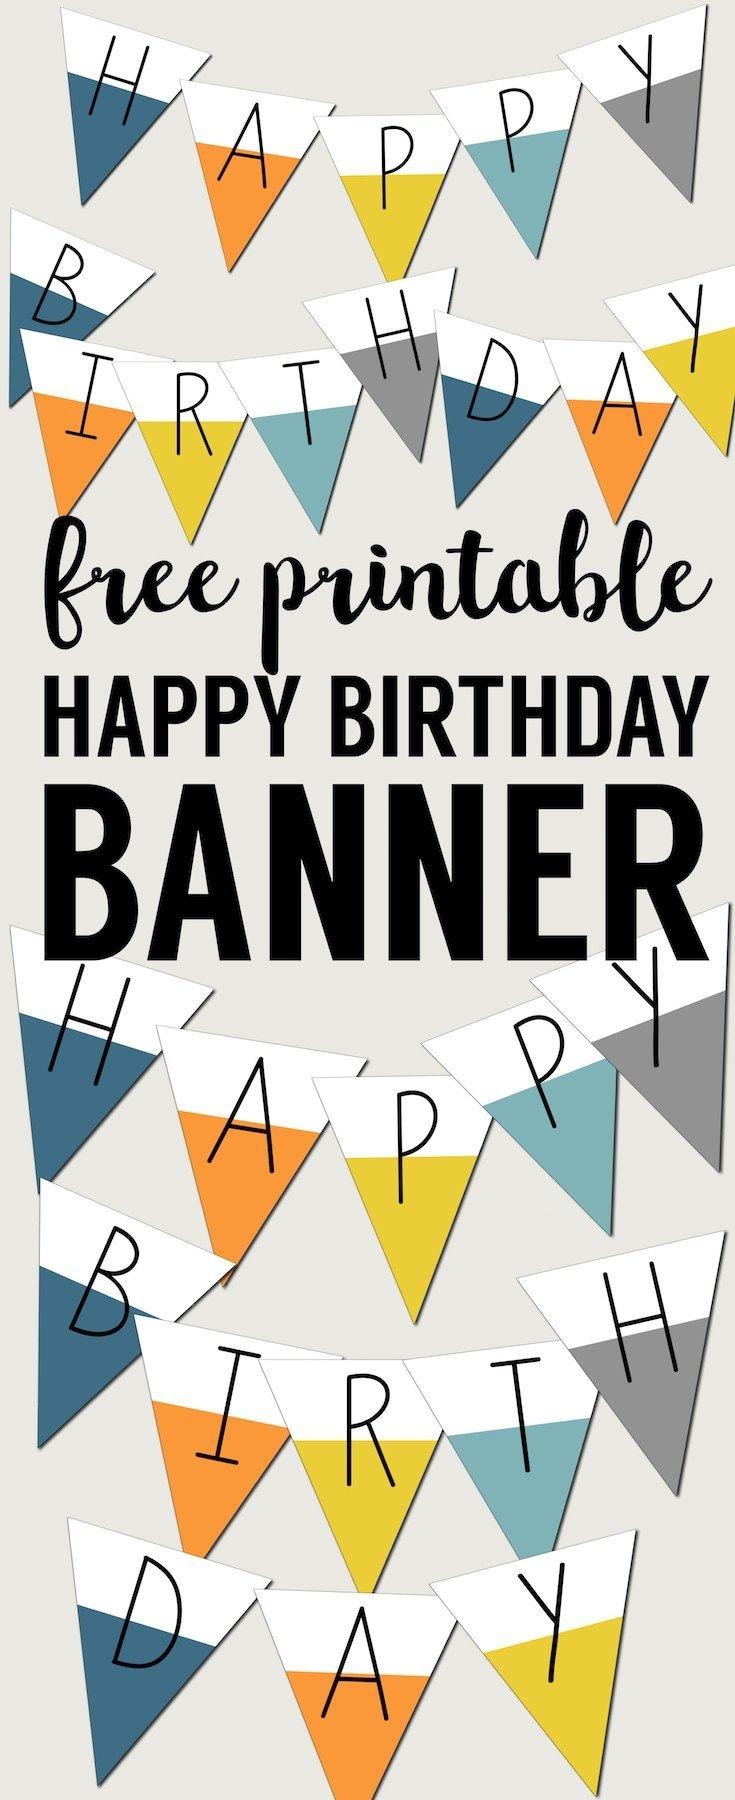 Free Printable Happy Birthday Banner | Preschool | Happy Birthday - Free Printable Happy Birthday Signs